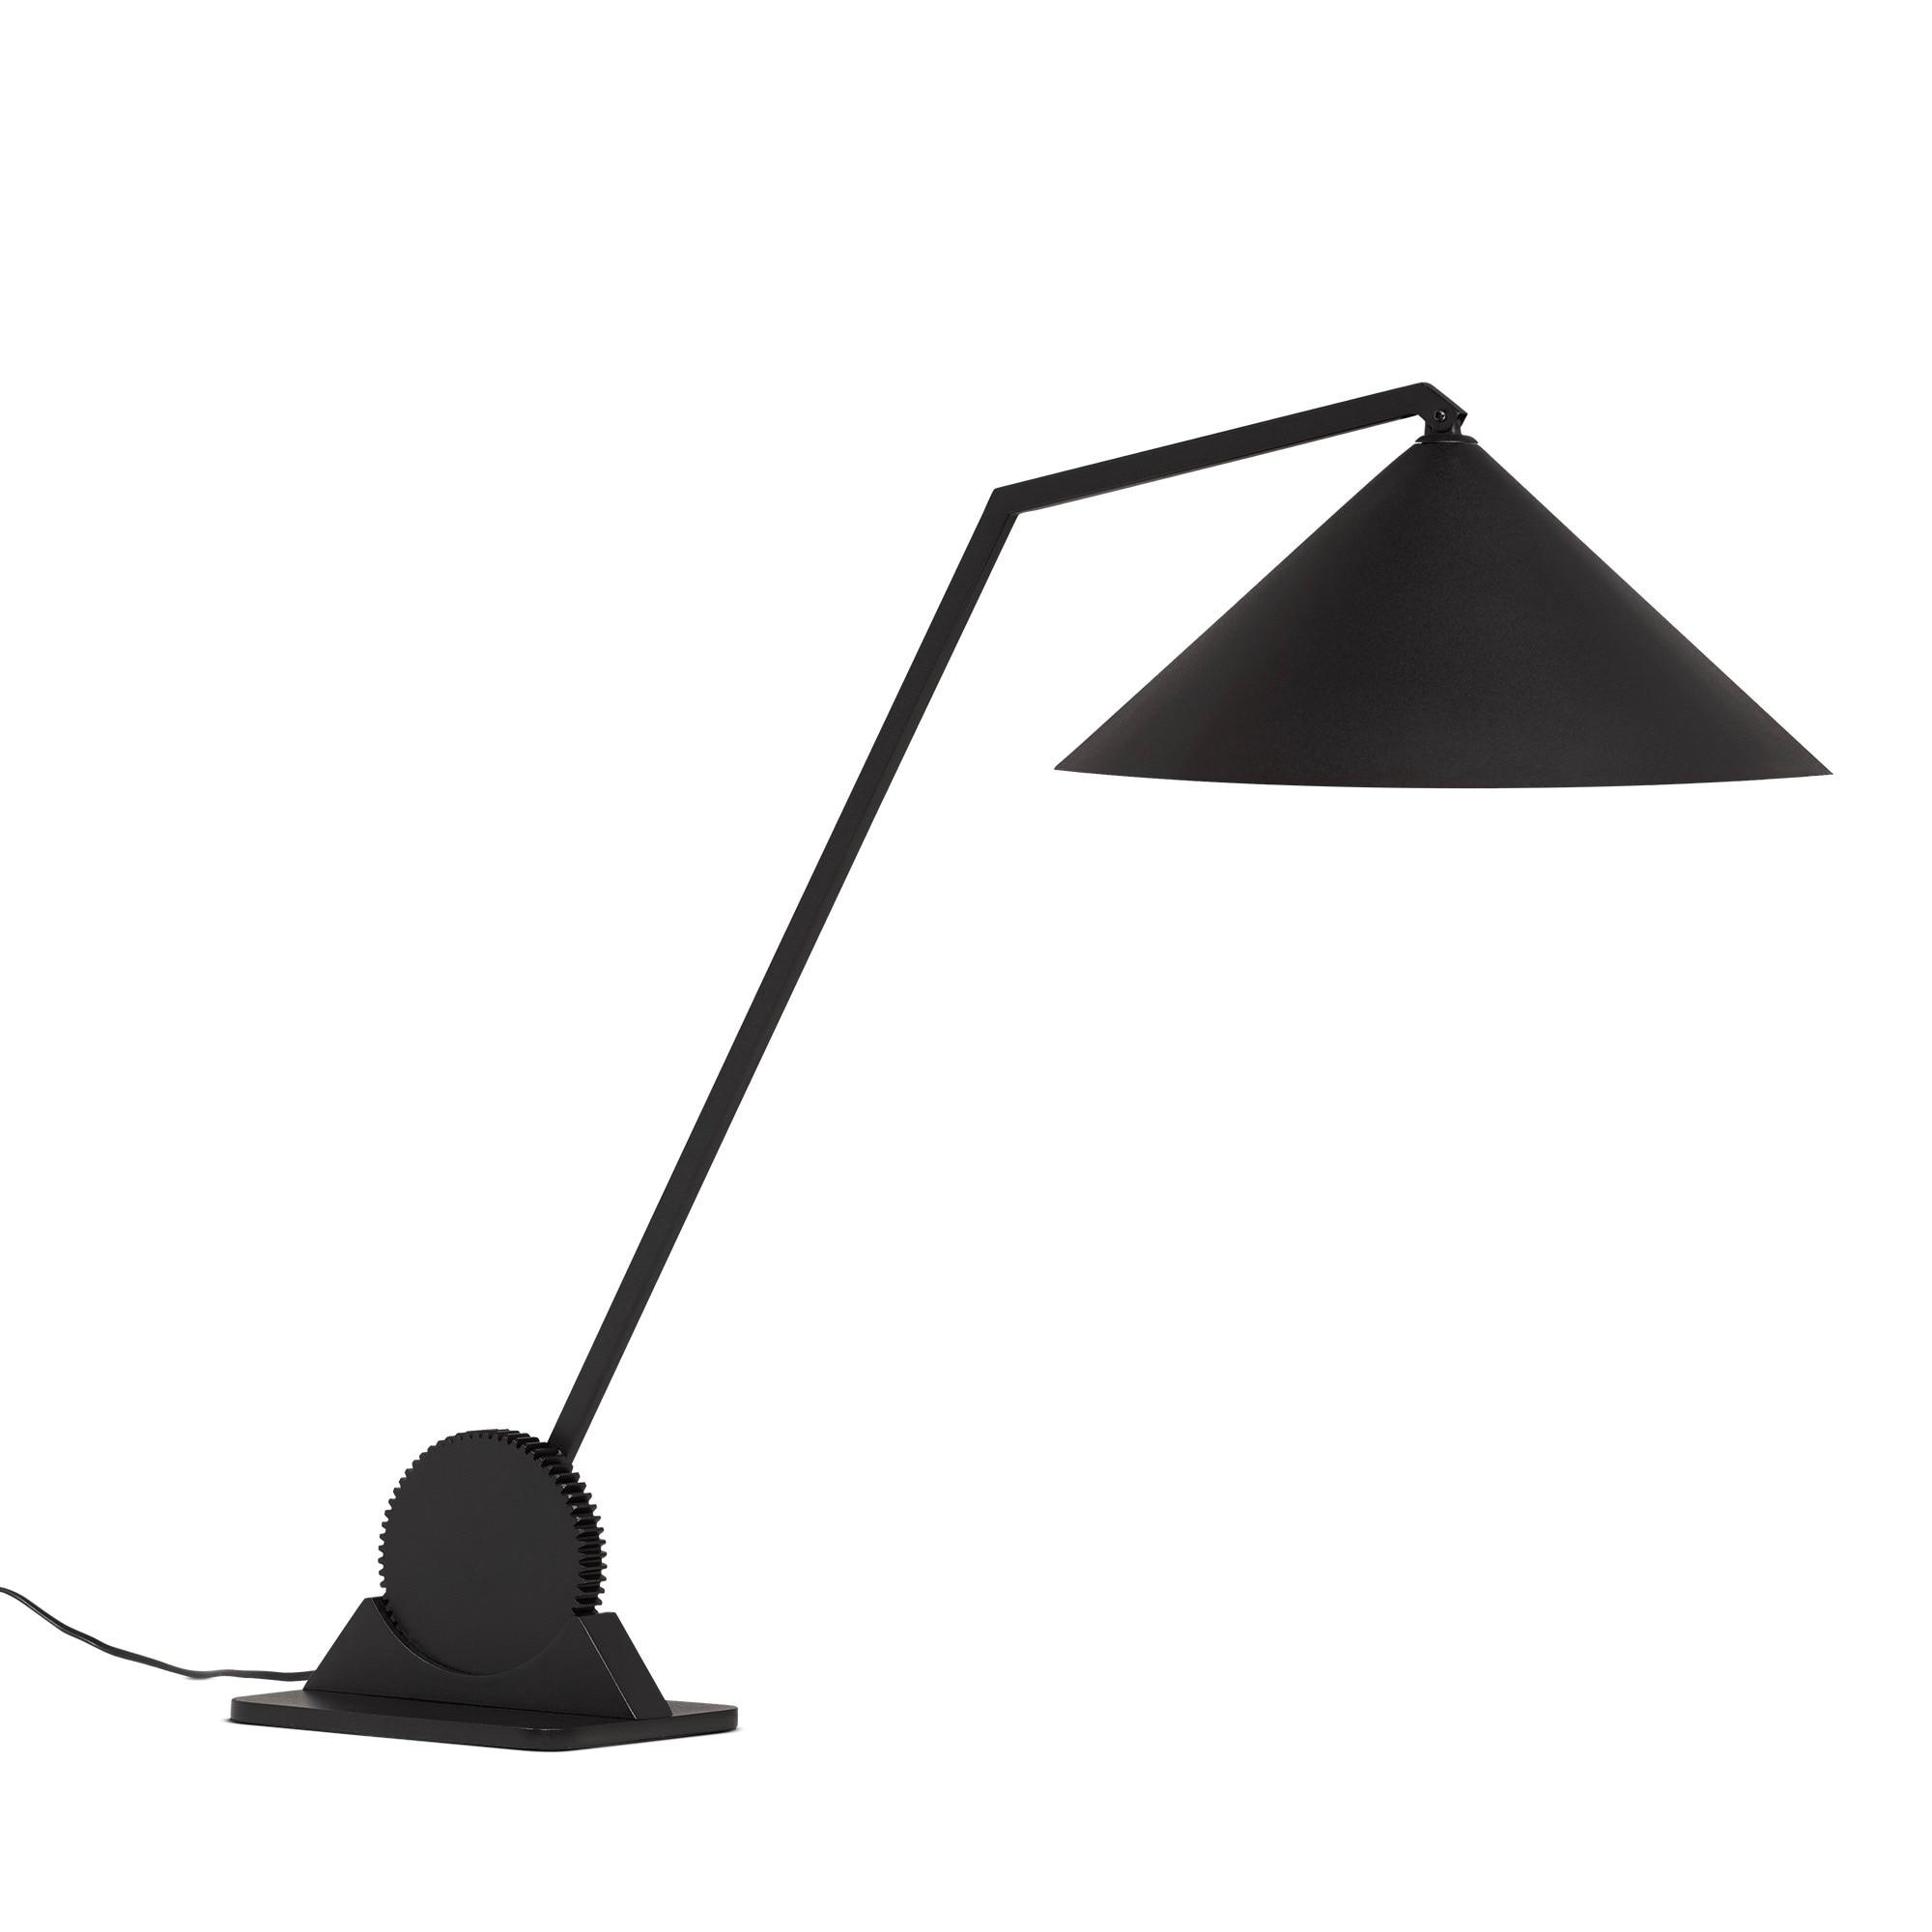 Gear bordslampa svart